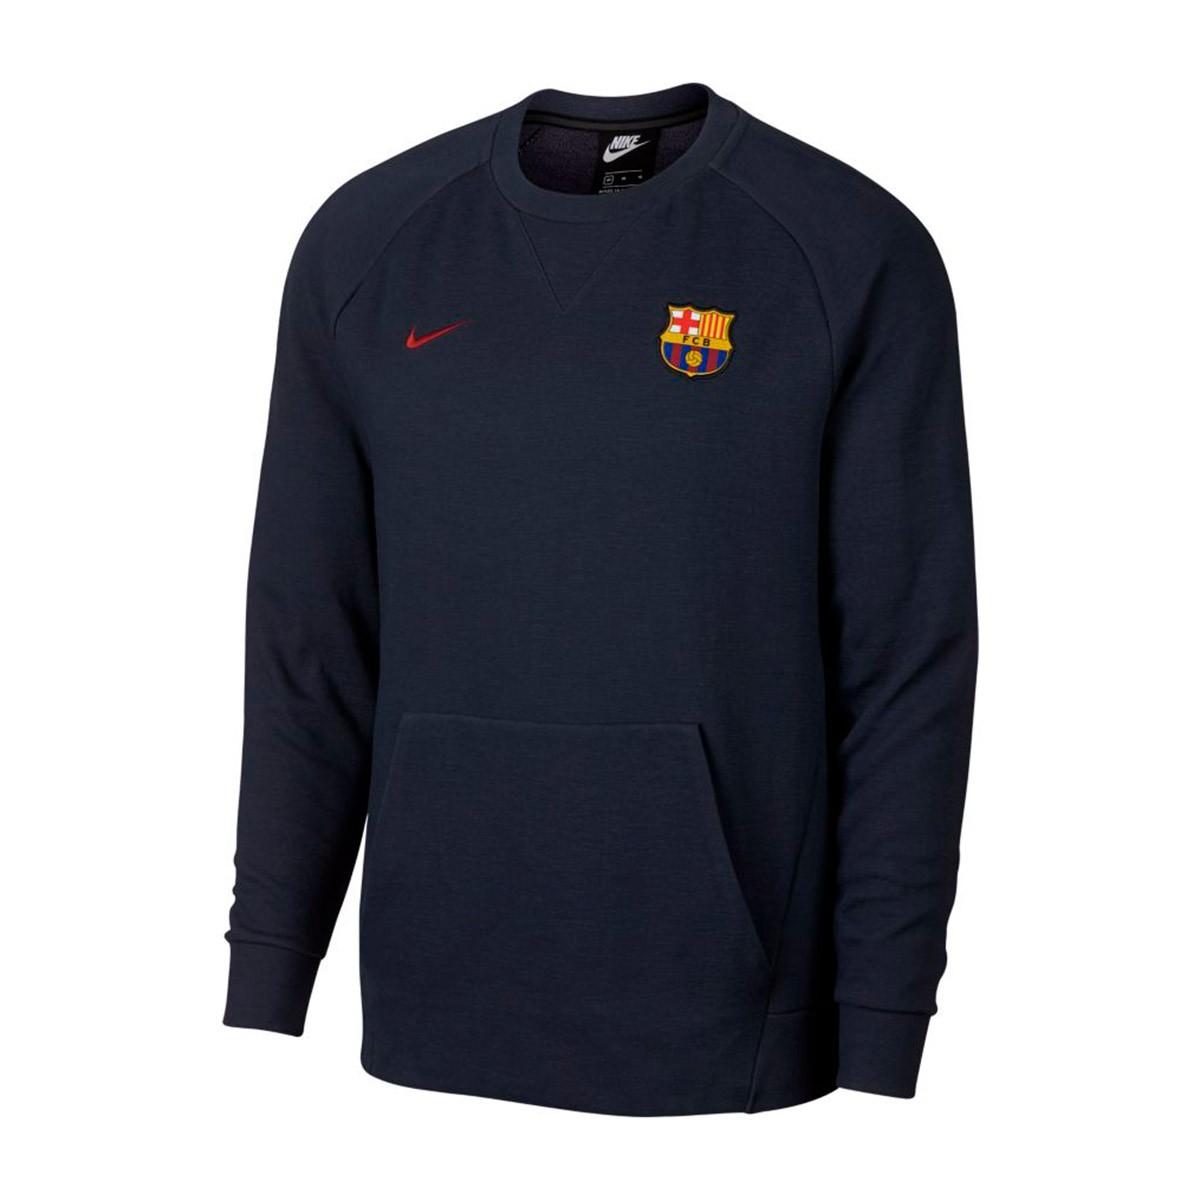 Nike FC Barcelona mikina   sveter modrý pánsky 235a7695605